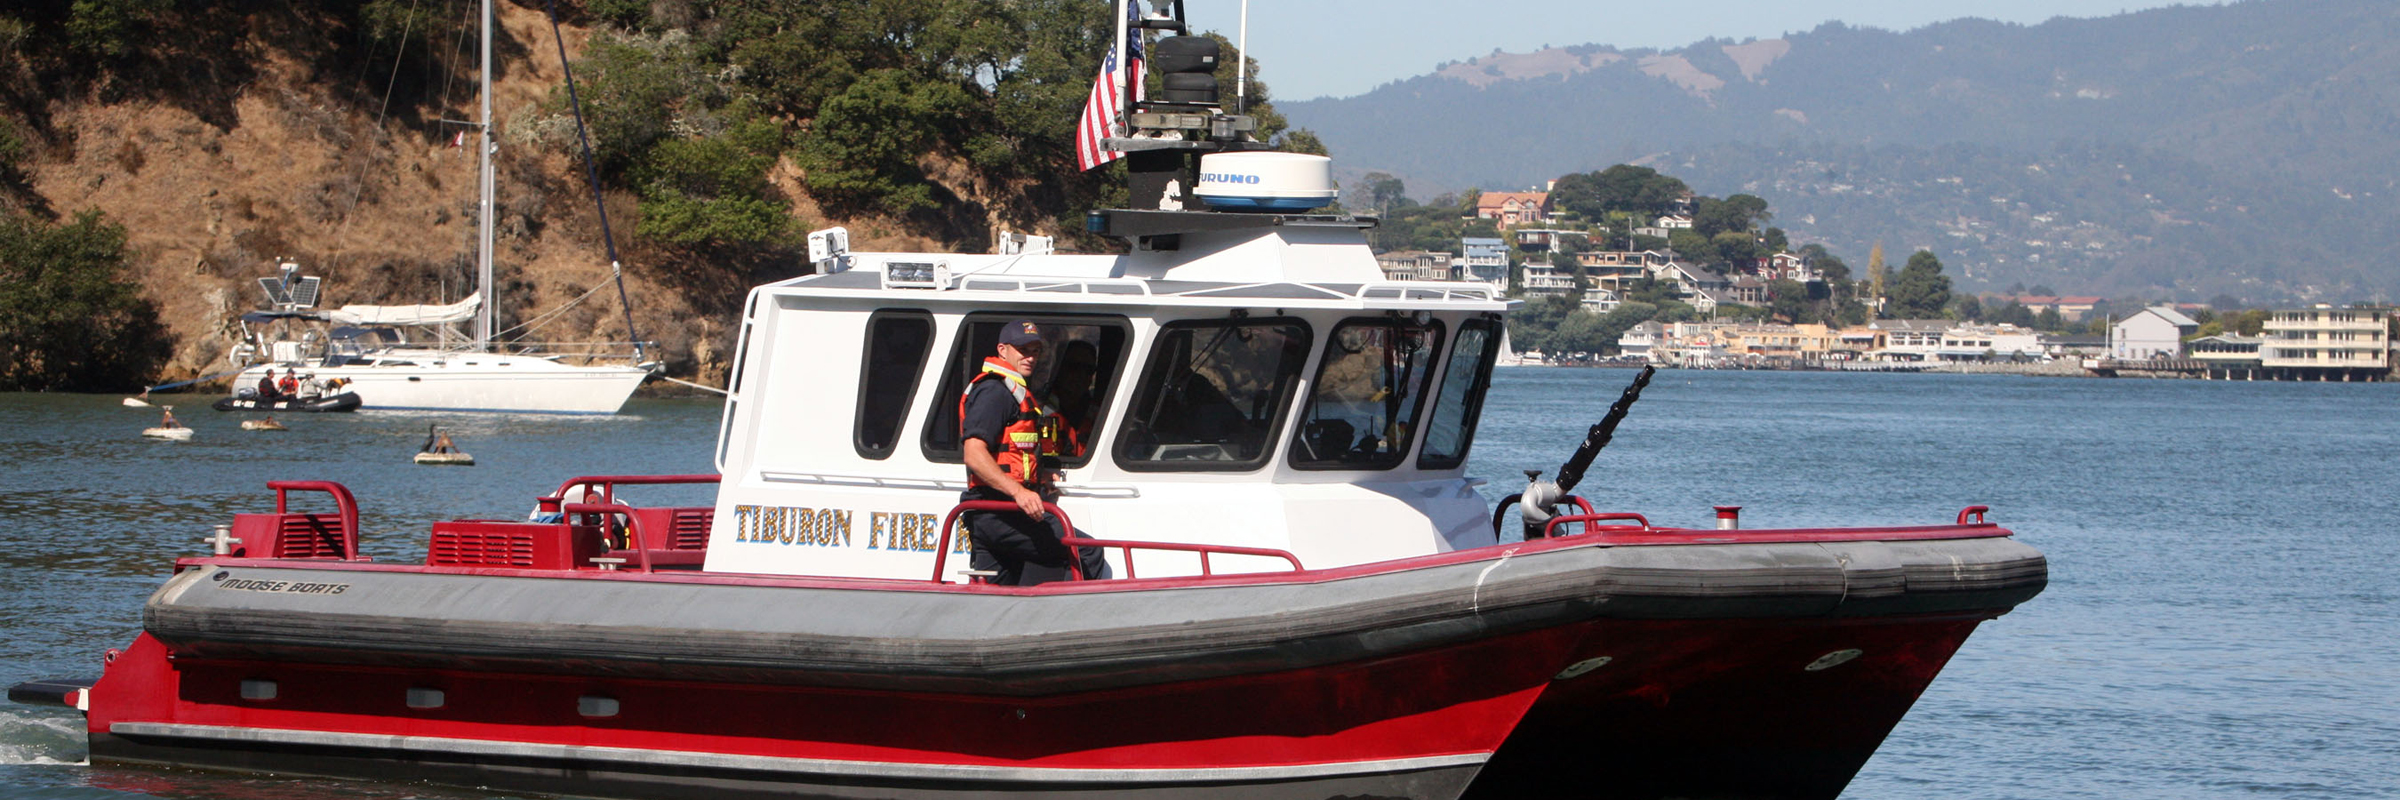 Tiburon Fire Protection District